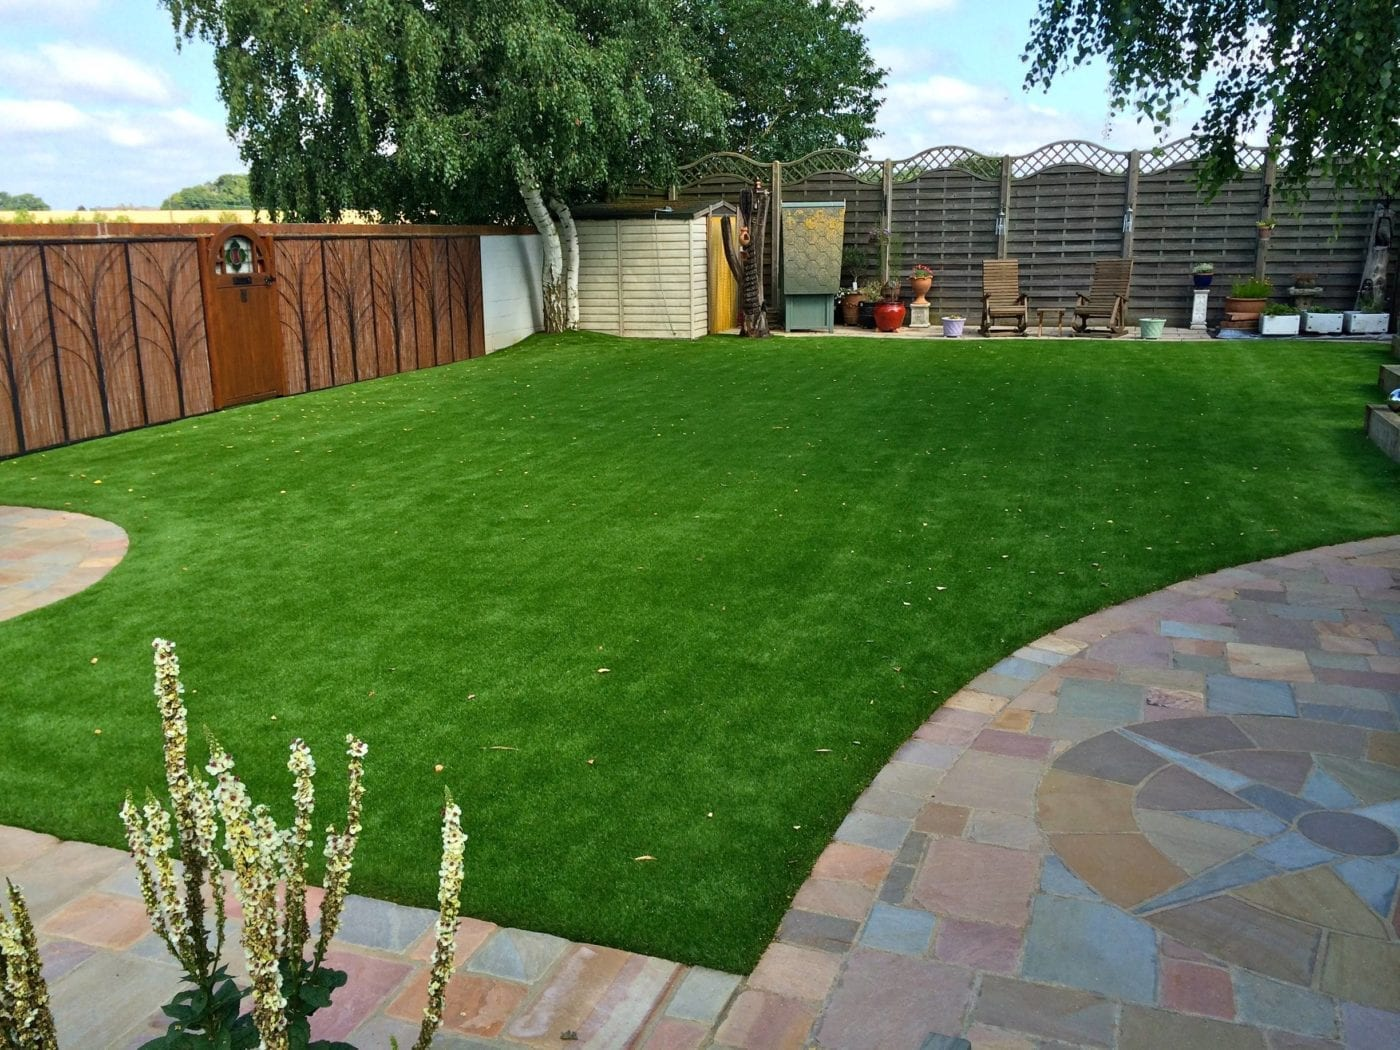 Easigrass Artificial Grass from Diamond Services